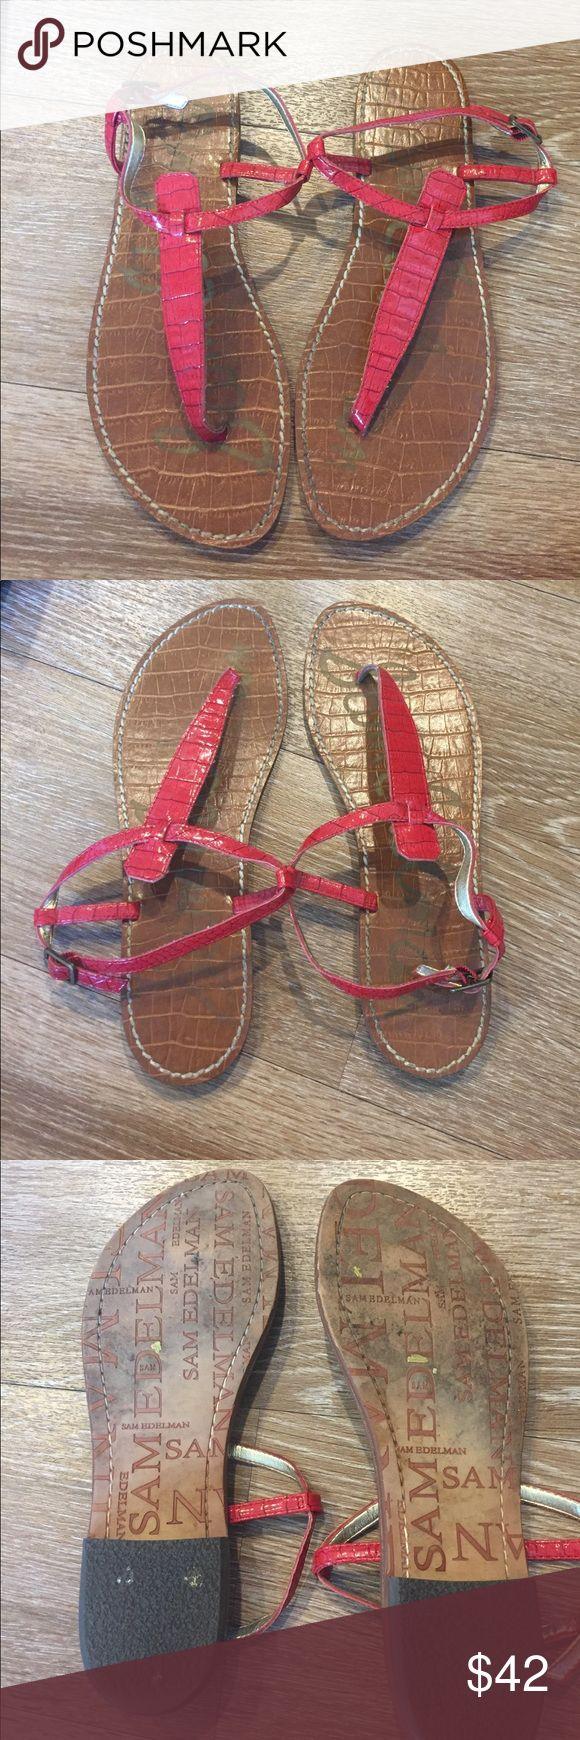 Sam Edelman GiGi Sandal Red Snake Skin Size 8 Sam Edelman GiGi Sandal Red Snake Skin Size 8. Sam Edelman's hottest summer Sandal. Good condition. So cute Sam Edelman Shoes Sandals